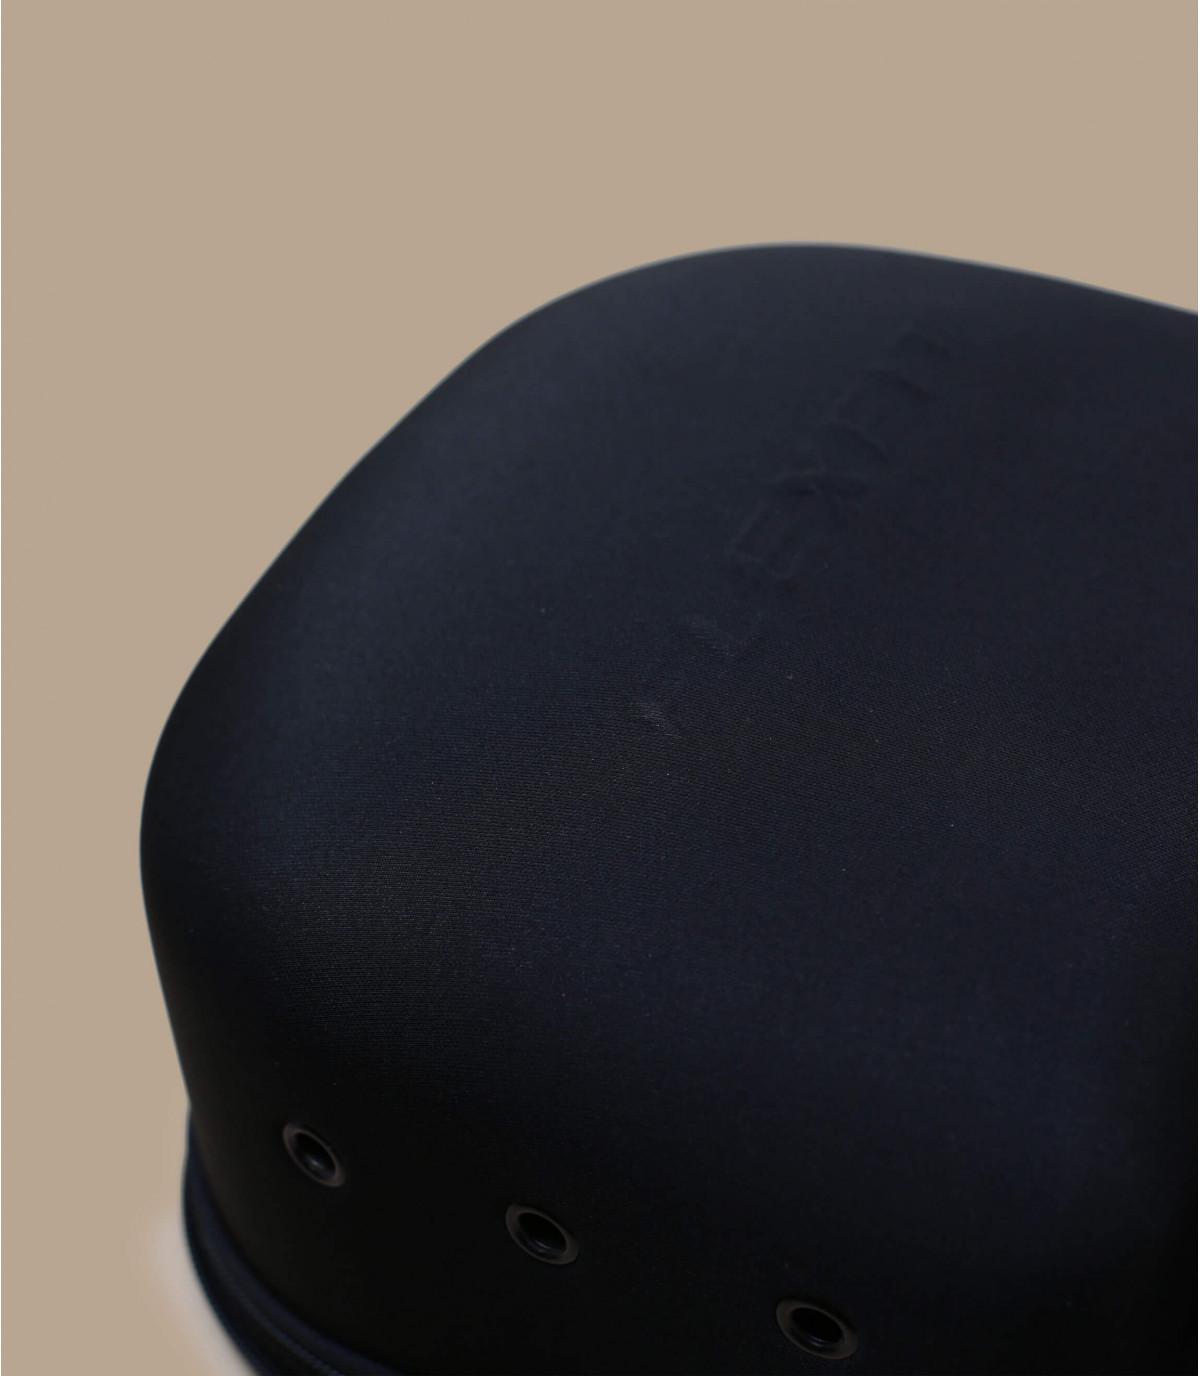 Details Cap box x6 - afbeeling 3